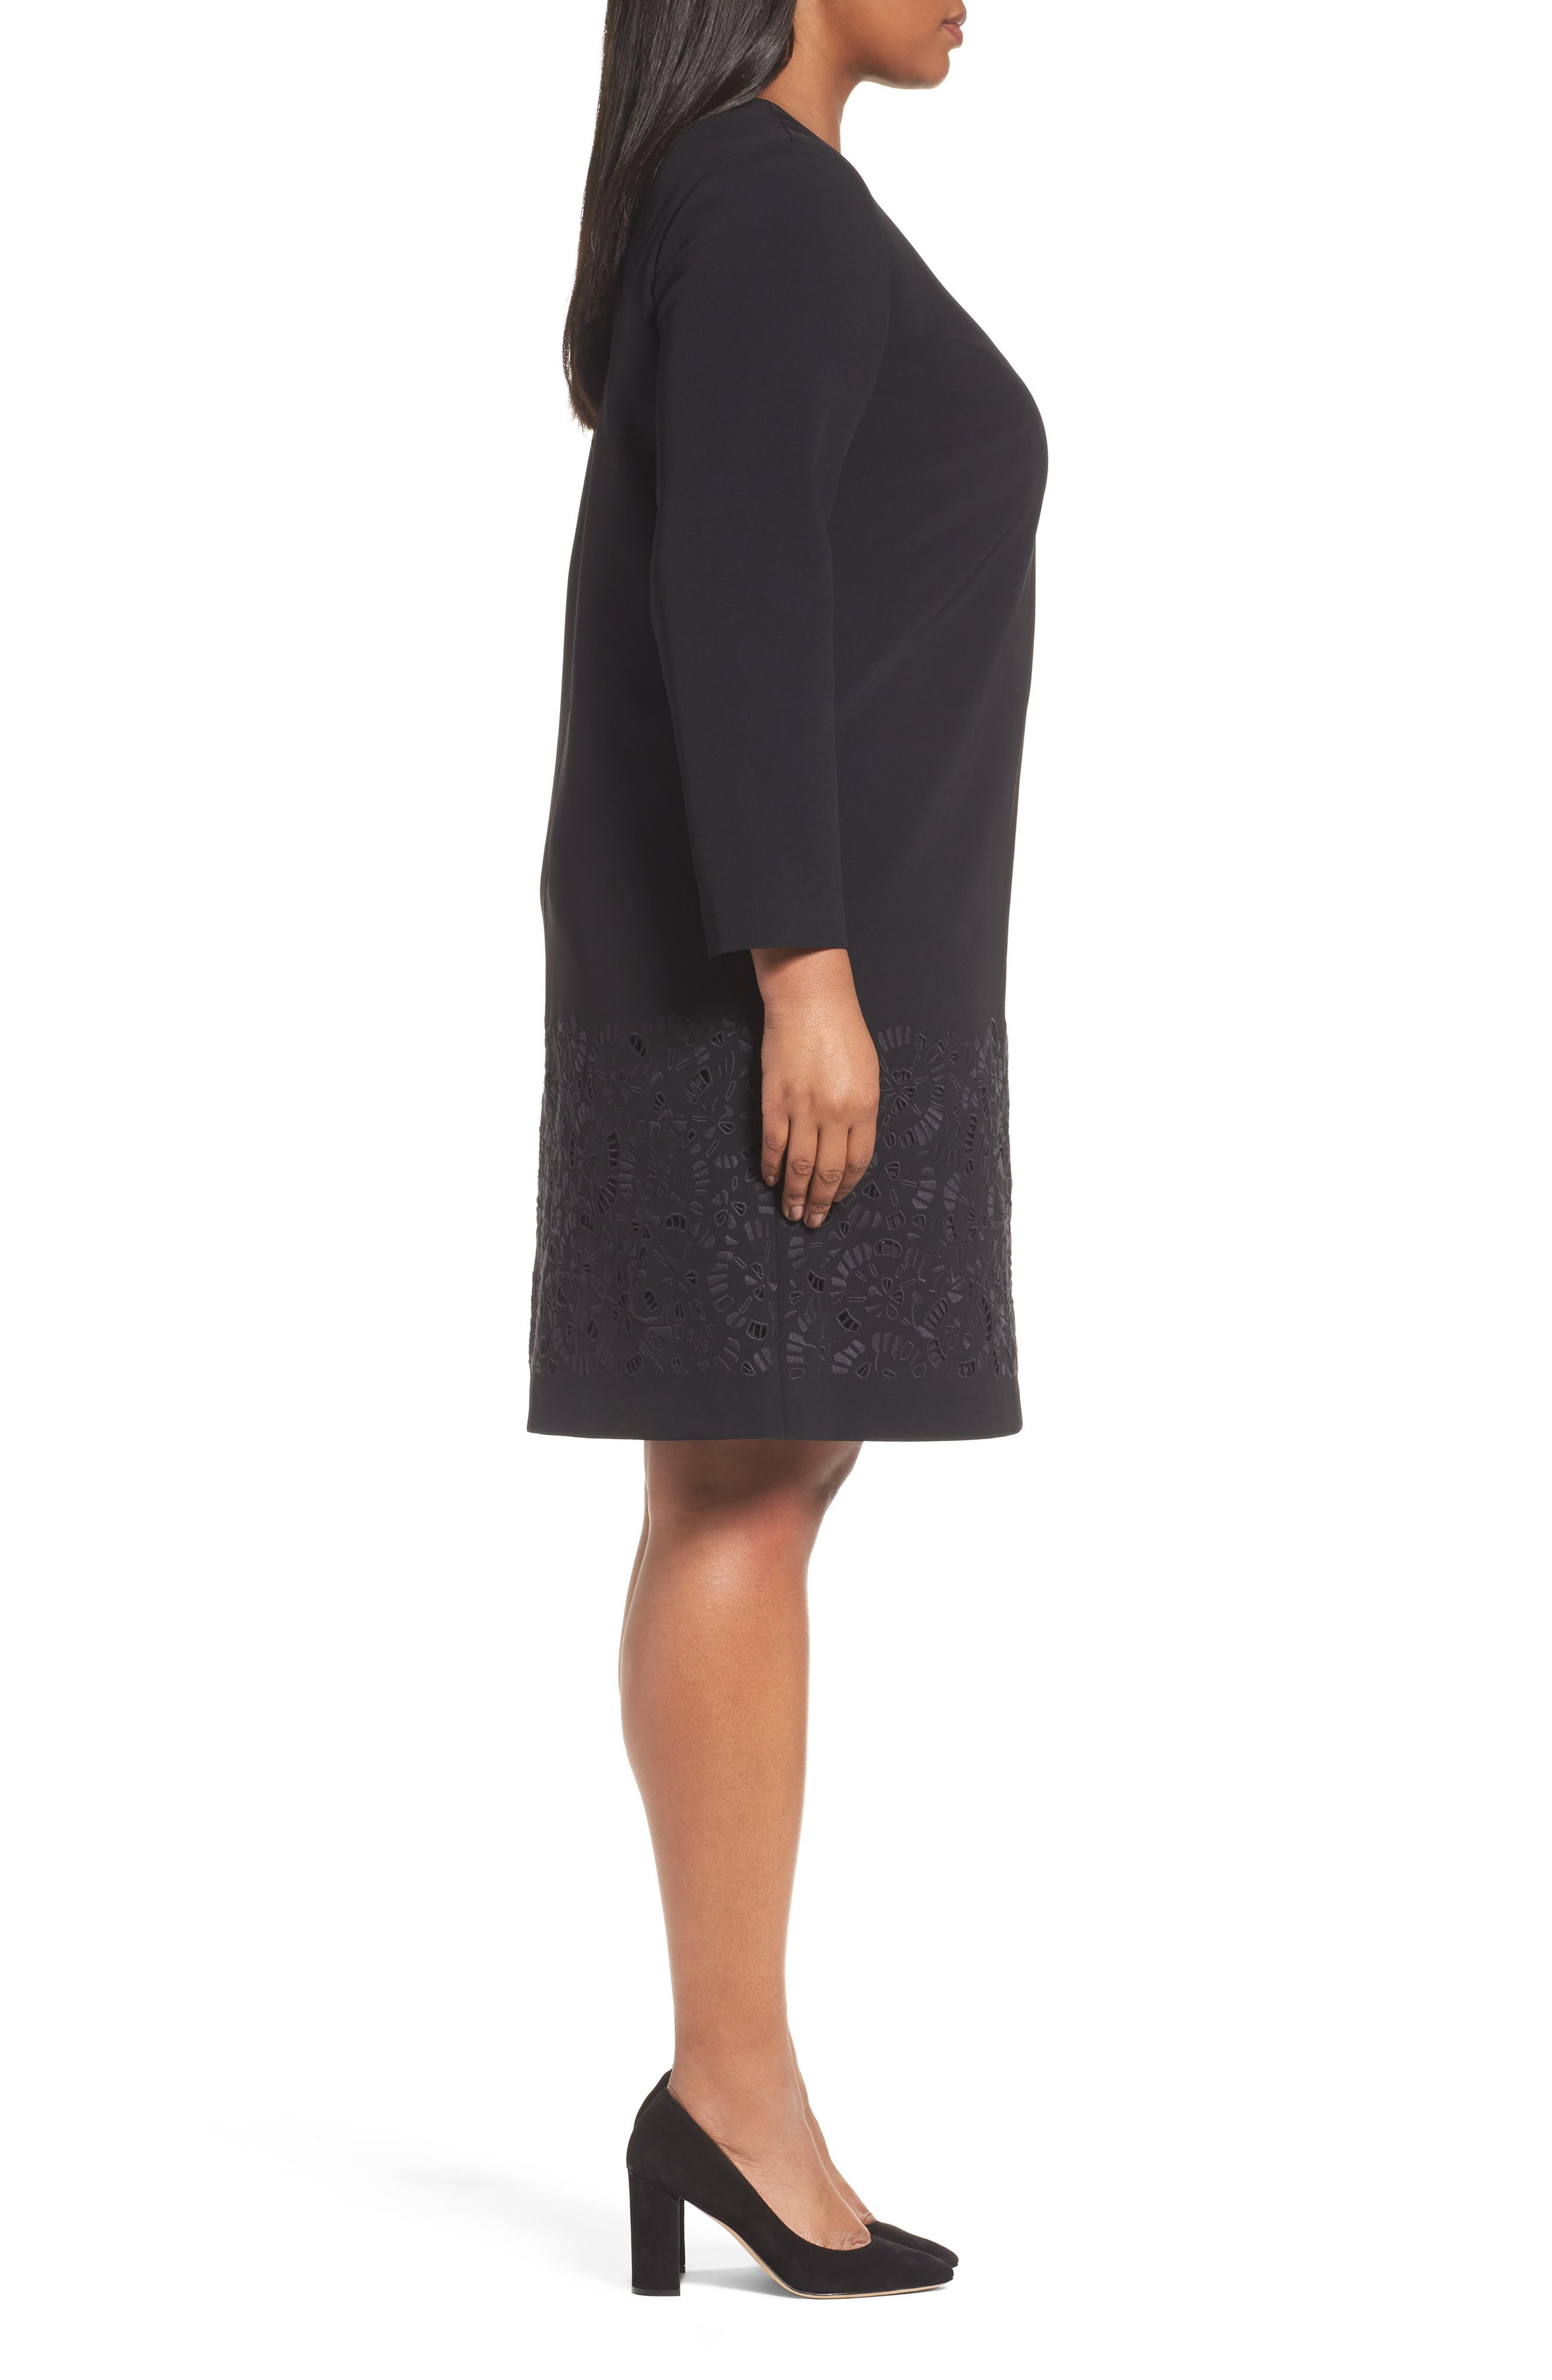 Corbin Laser Cut Dress,                             Alternate thumbnail 3, color,                             Black